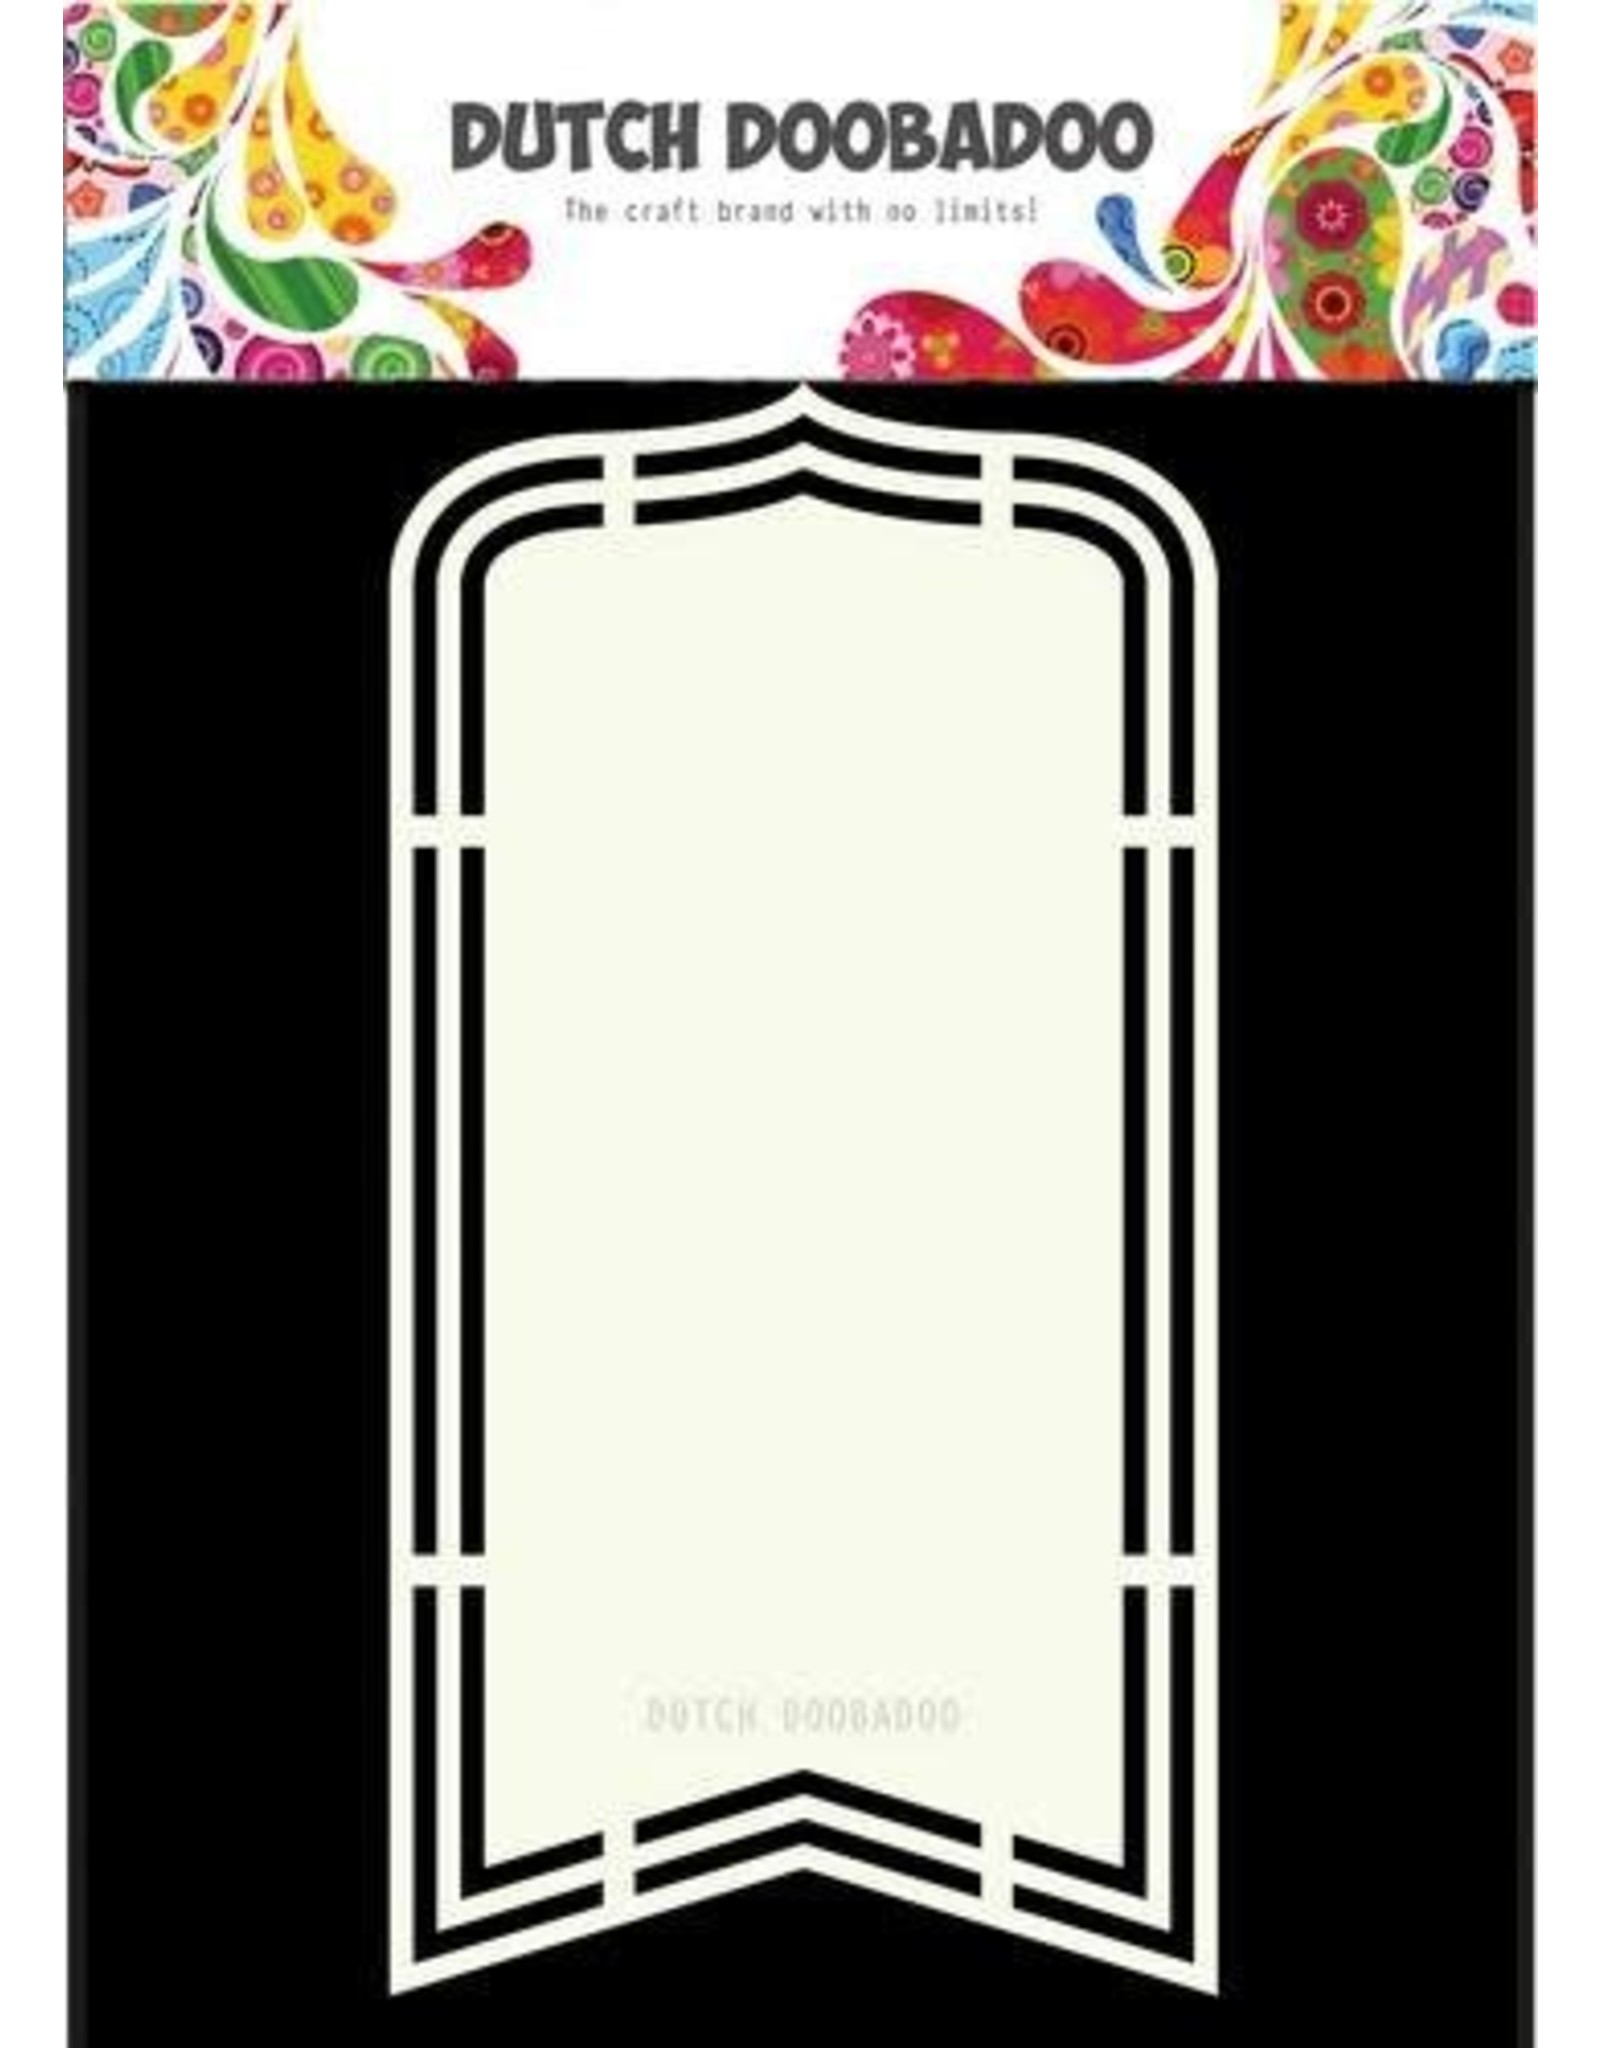 Dutch Doobadoo Shape Art Dutch Doobadoo Dutch Shape Art Bookmark 2 470.713.165 A5